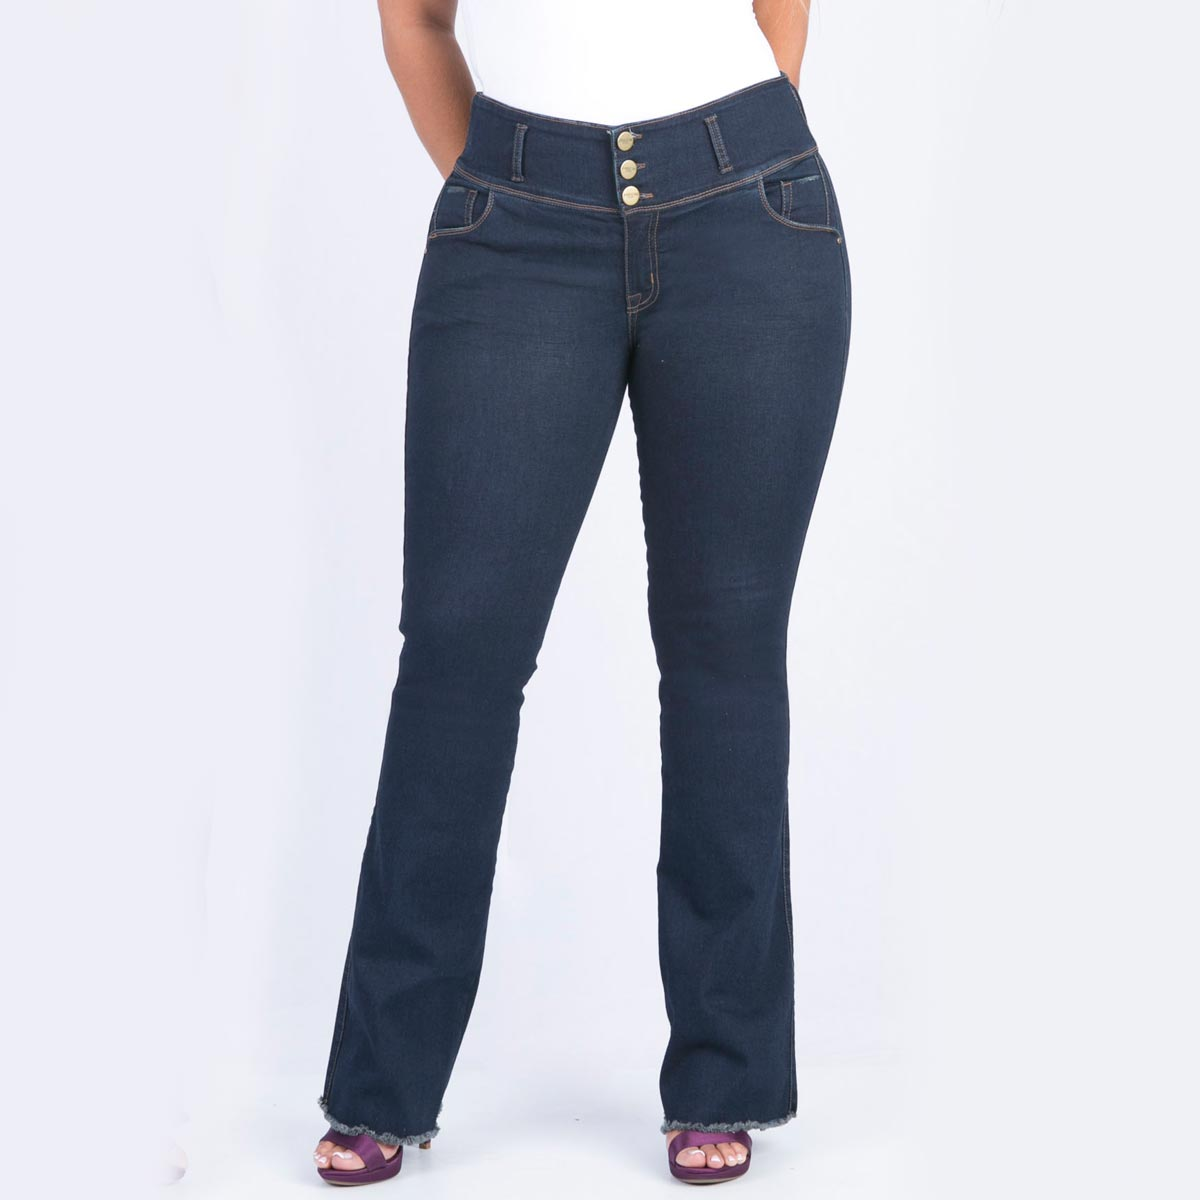 127e14bd9 Jean bota semicampana para mujer tallas grandes